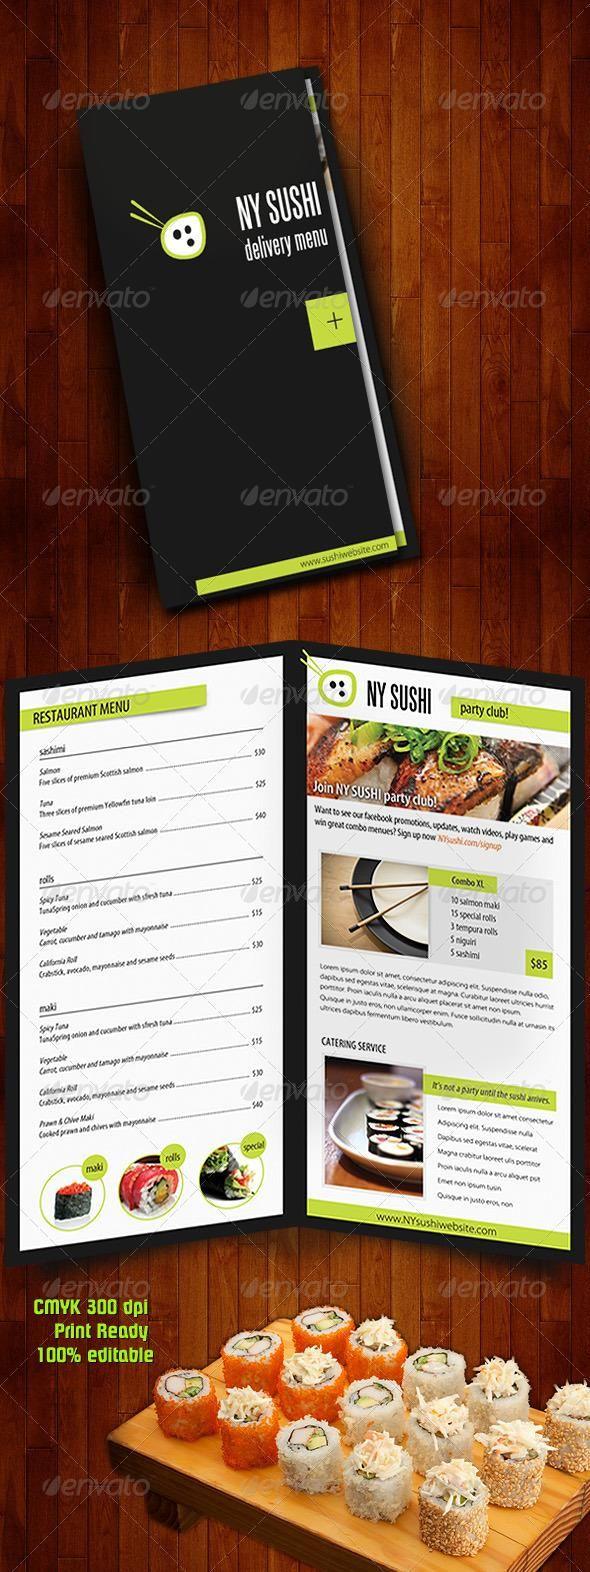 catering menu templates free